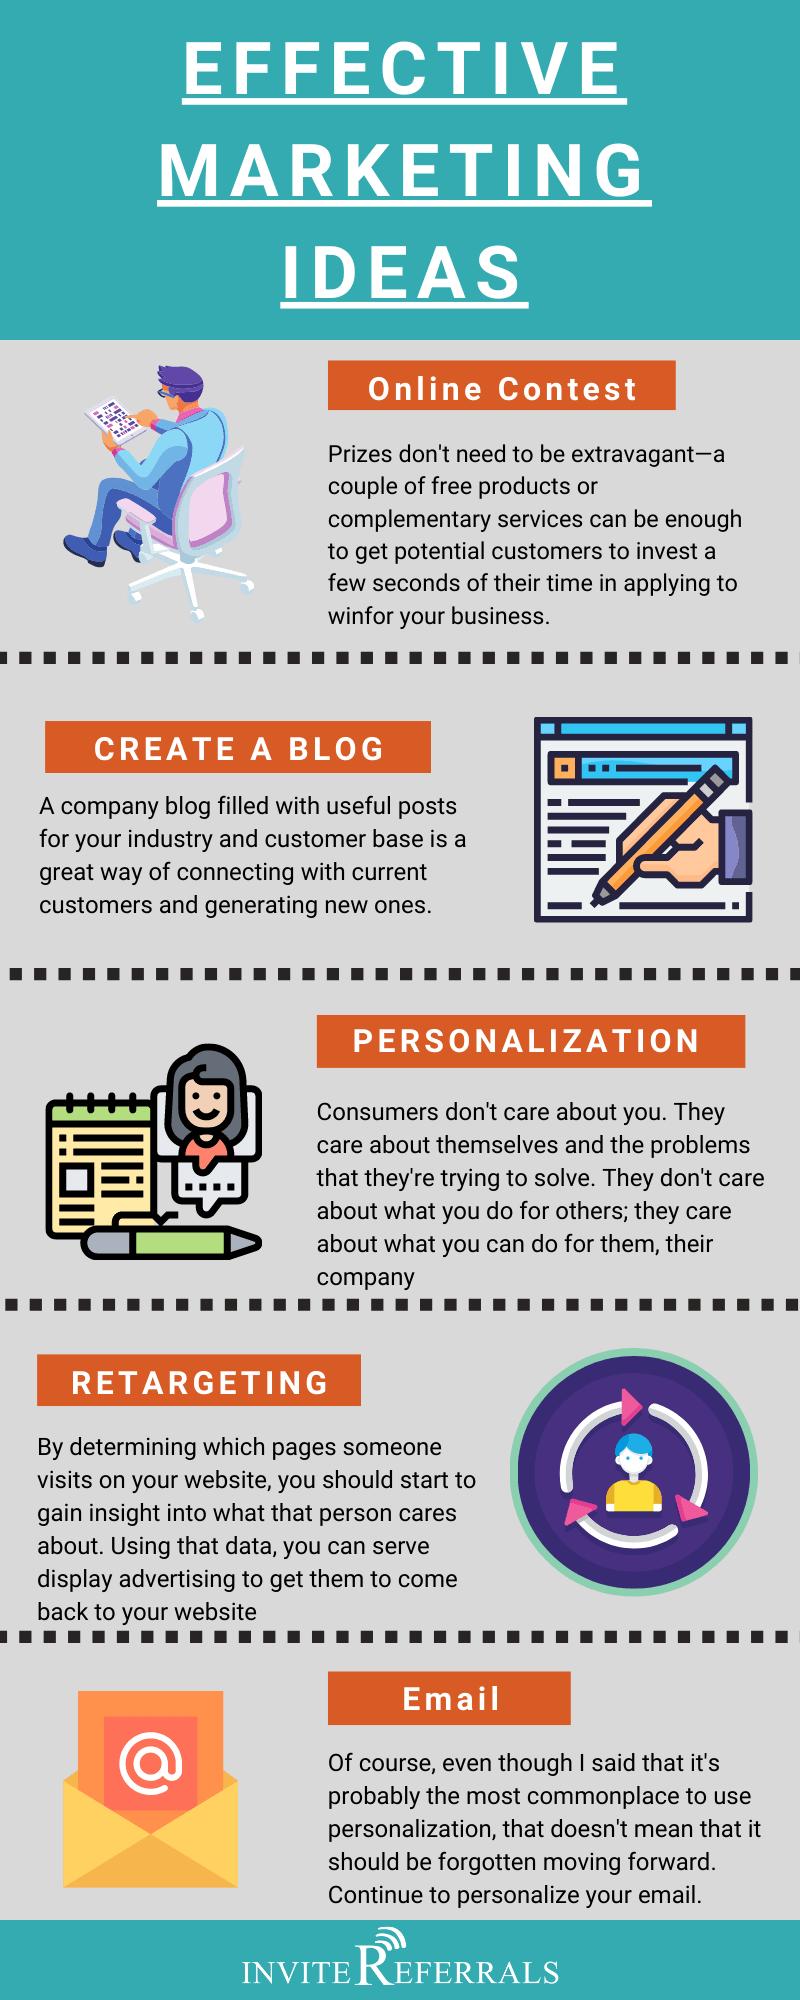 marketing ideas infographic.